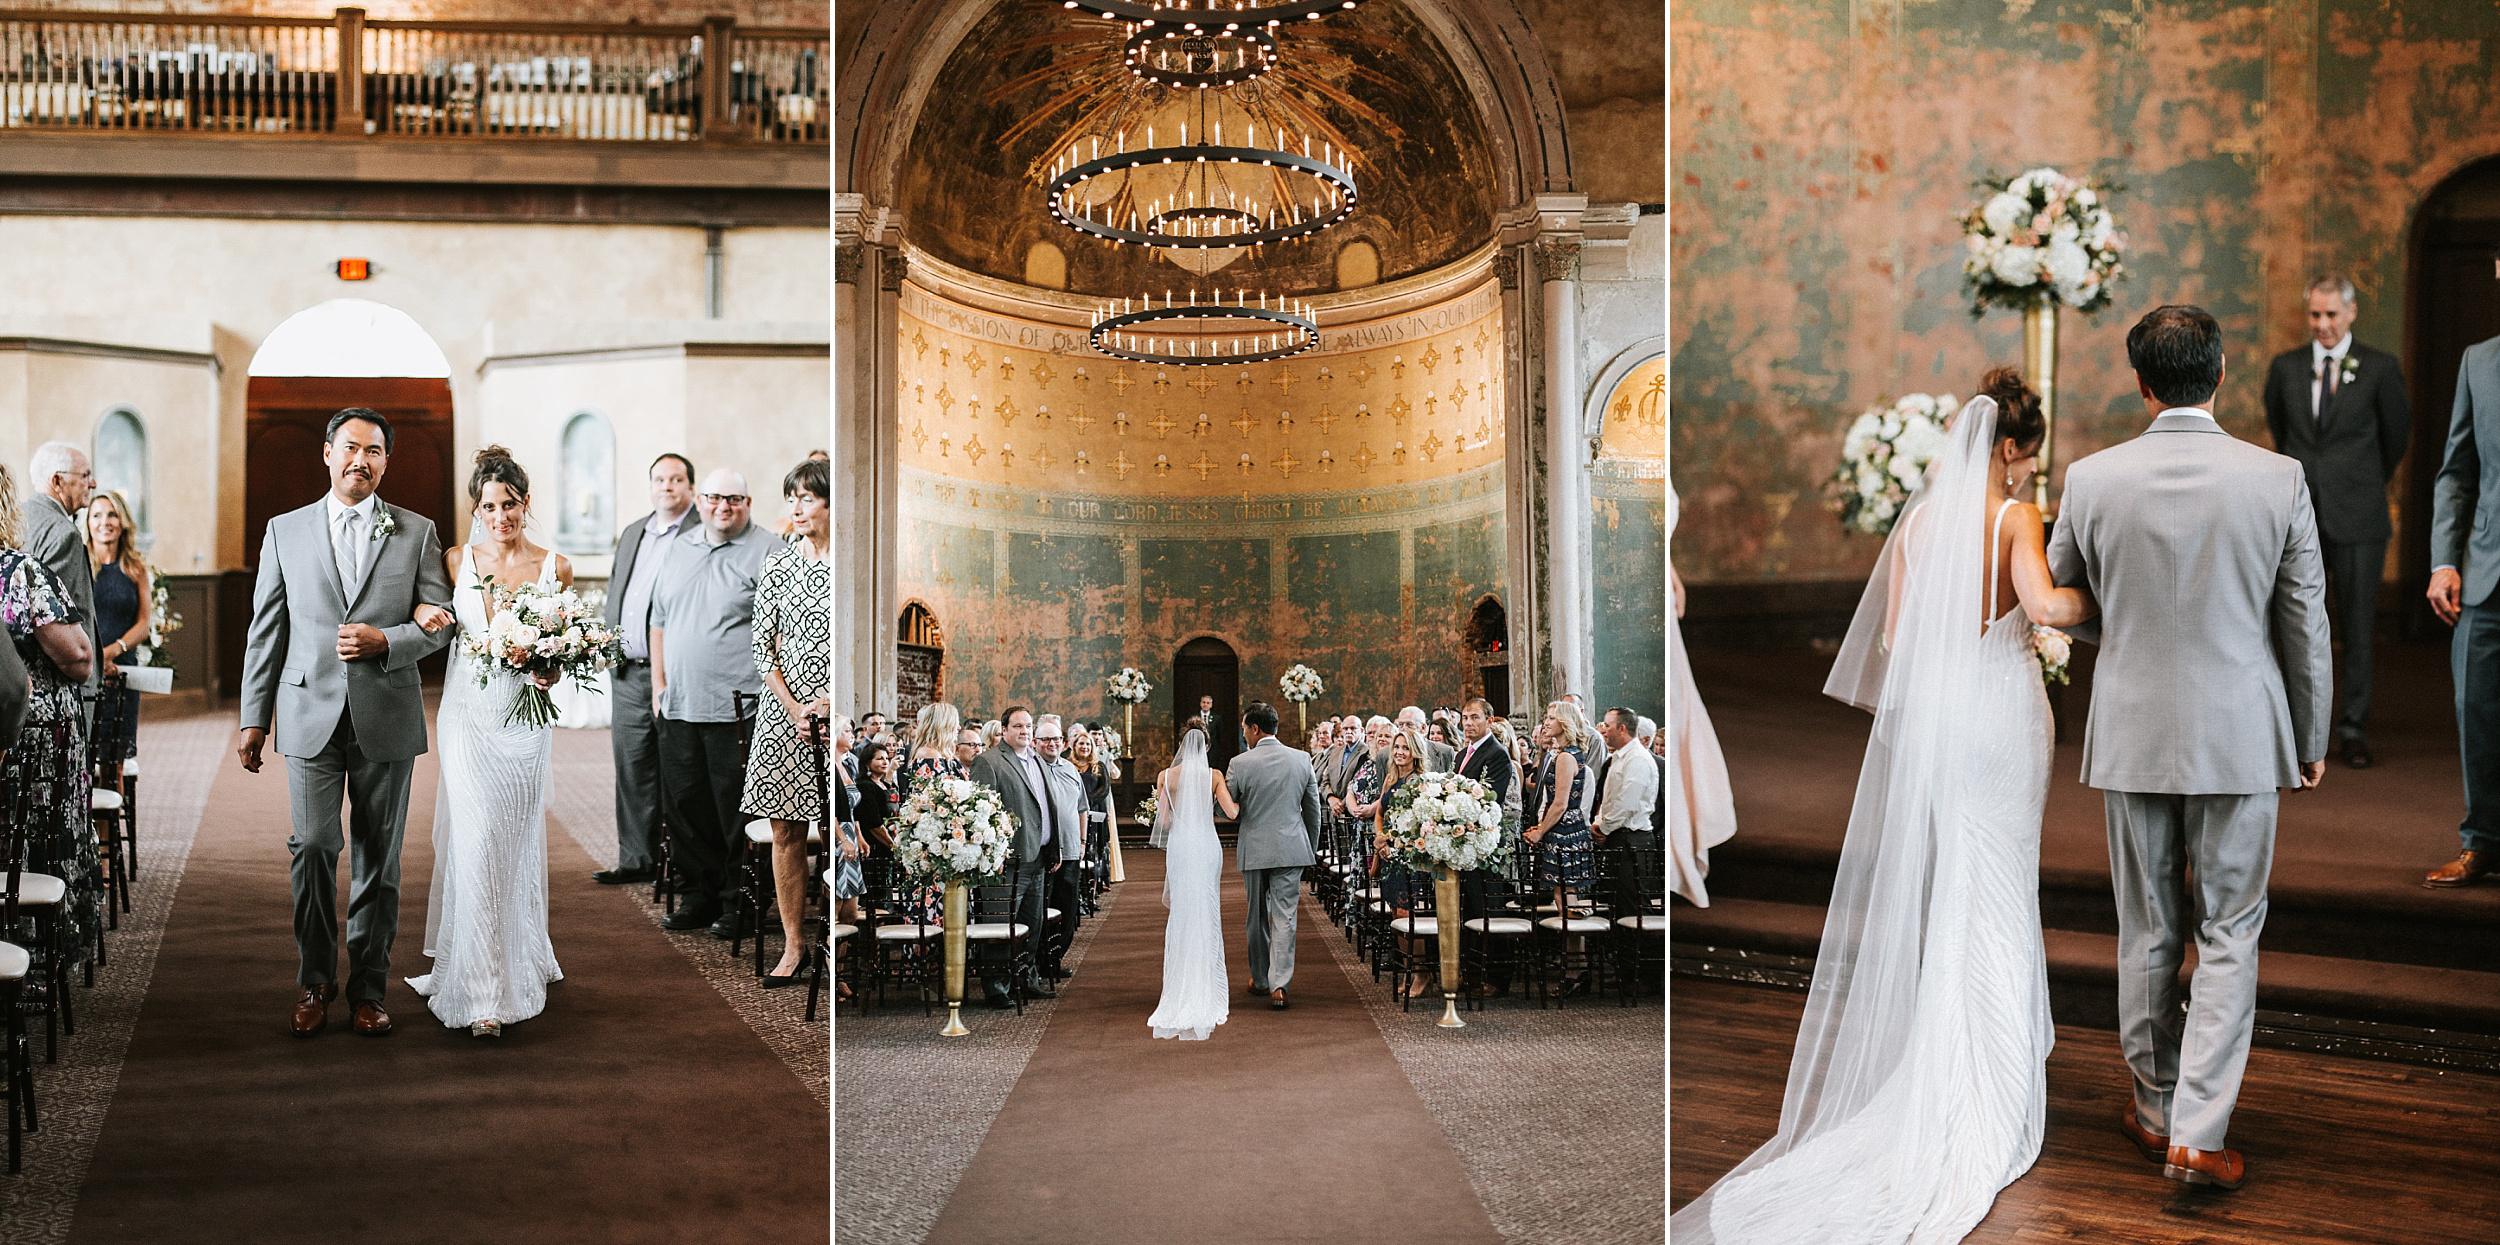 Brooke Townsend Photography - Cincinnati Wedding Photographer (109 of 170).jpg